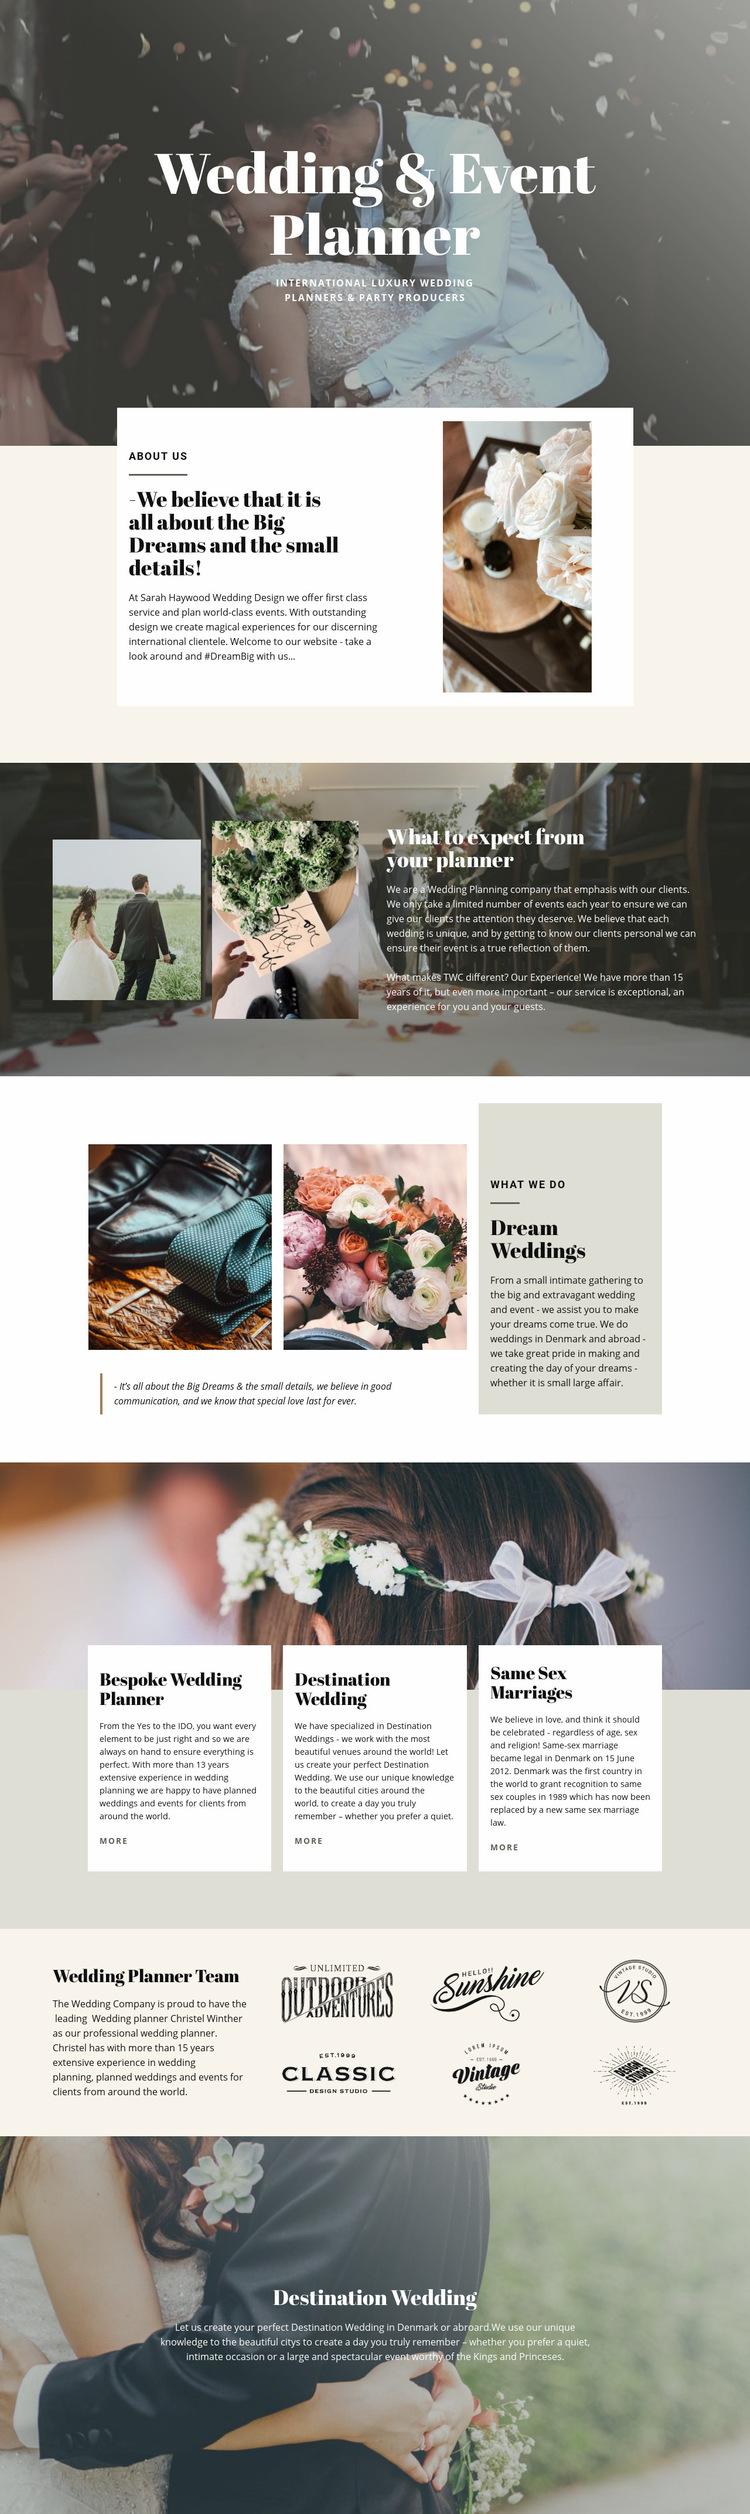 Biggest dream wedding Web Page Design